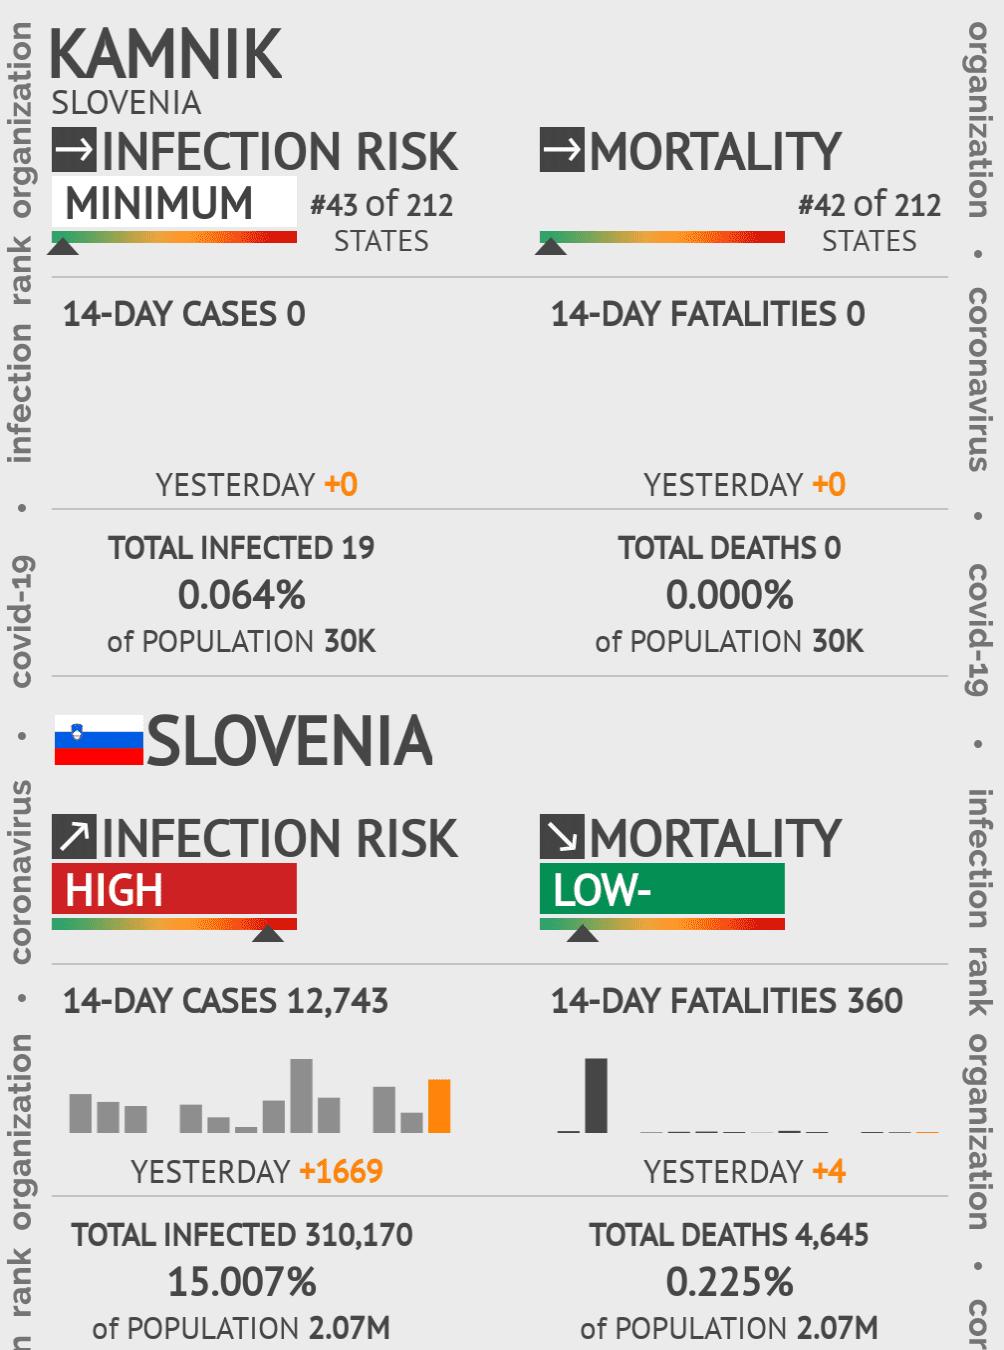 Kamnik Coronavirus Covid-19 Risk of Infection on May 14, 2020